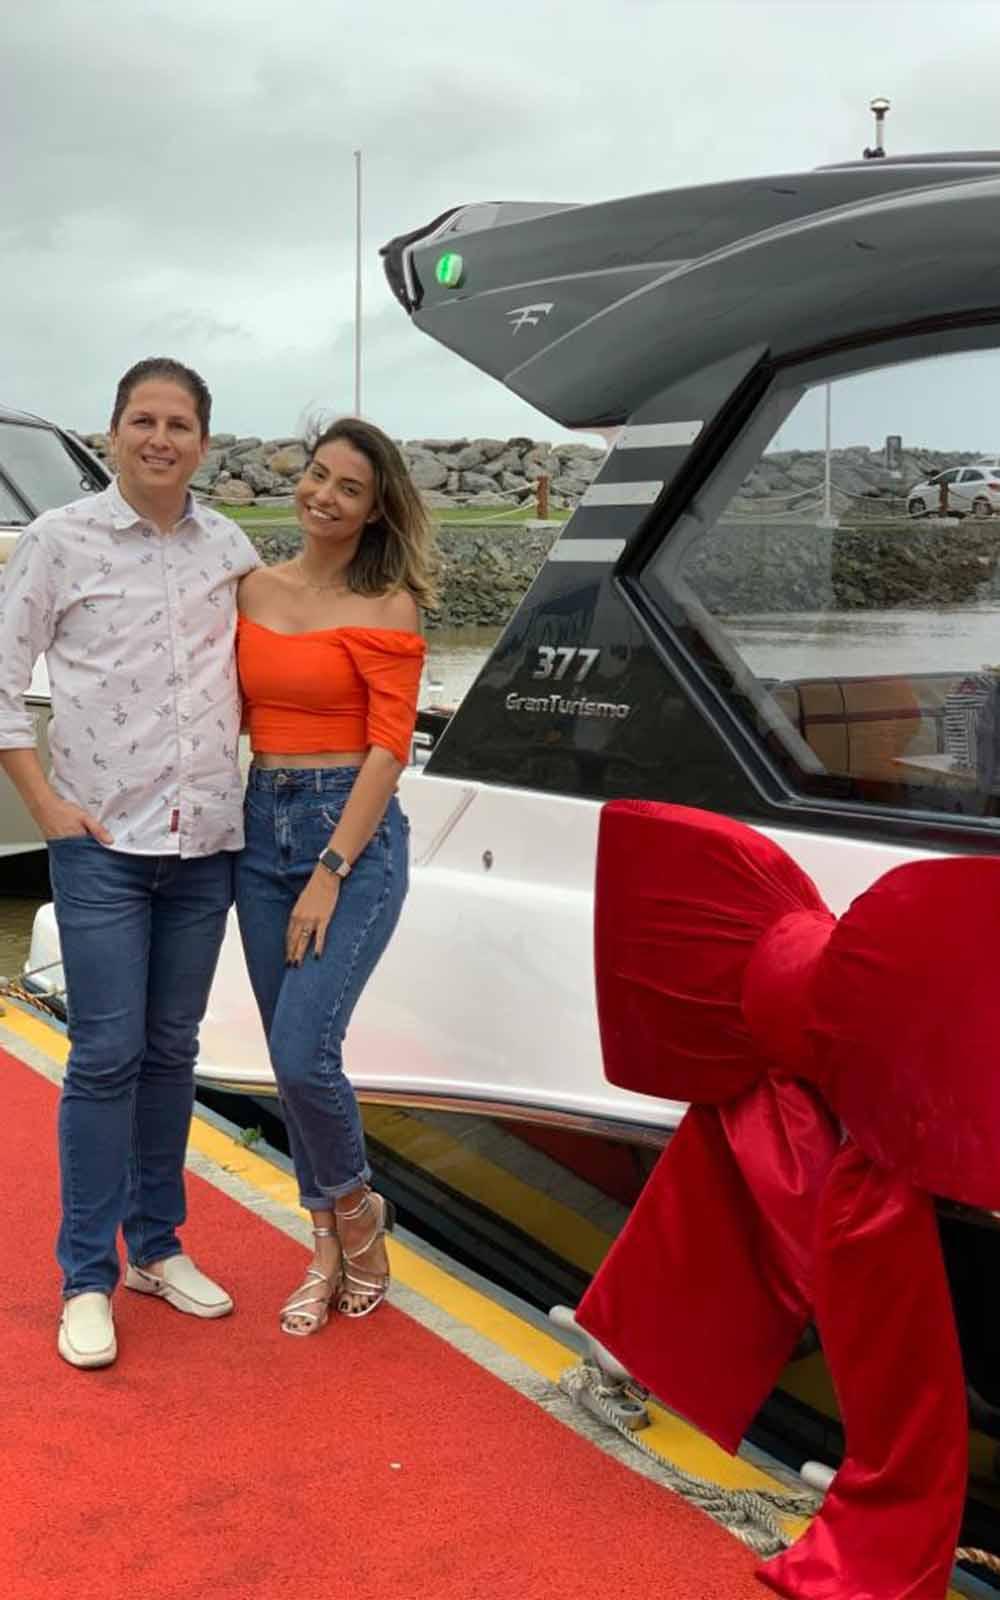 primeira fibrafort focker 377 gt - boat shopping